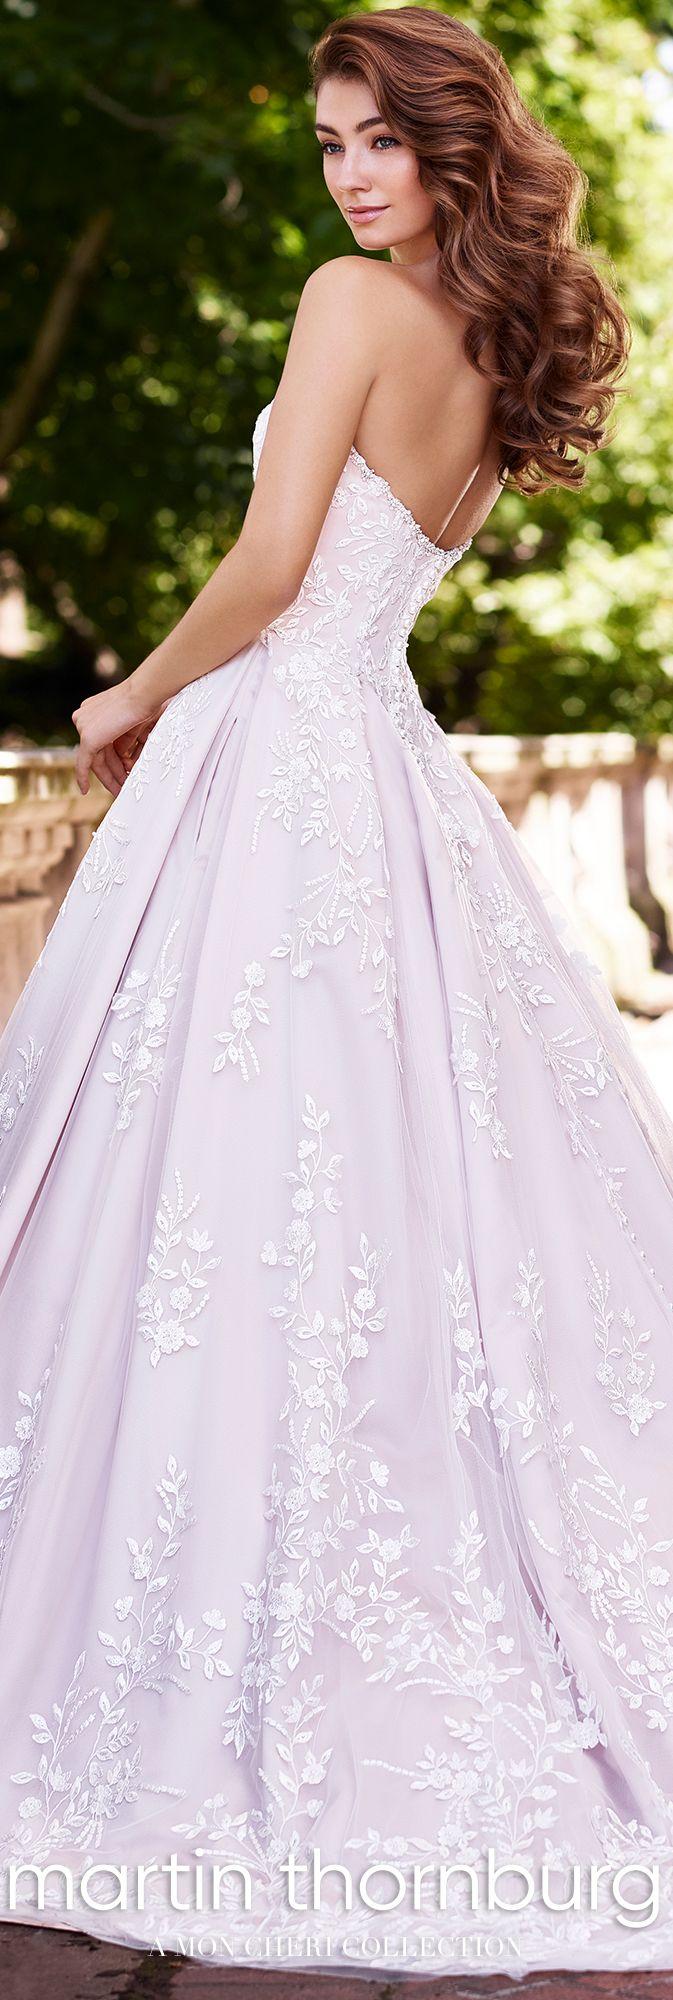 c2f046c7 119252 Hannah - Lace Satin Wedding Dress w Pockets - Mon Cheri ...